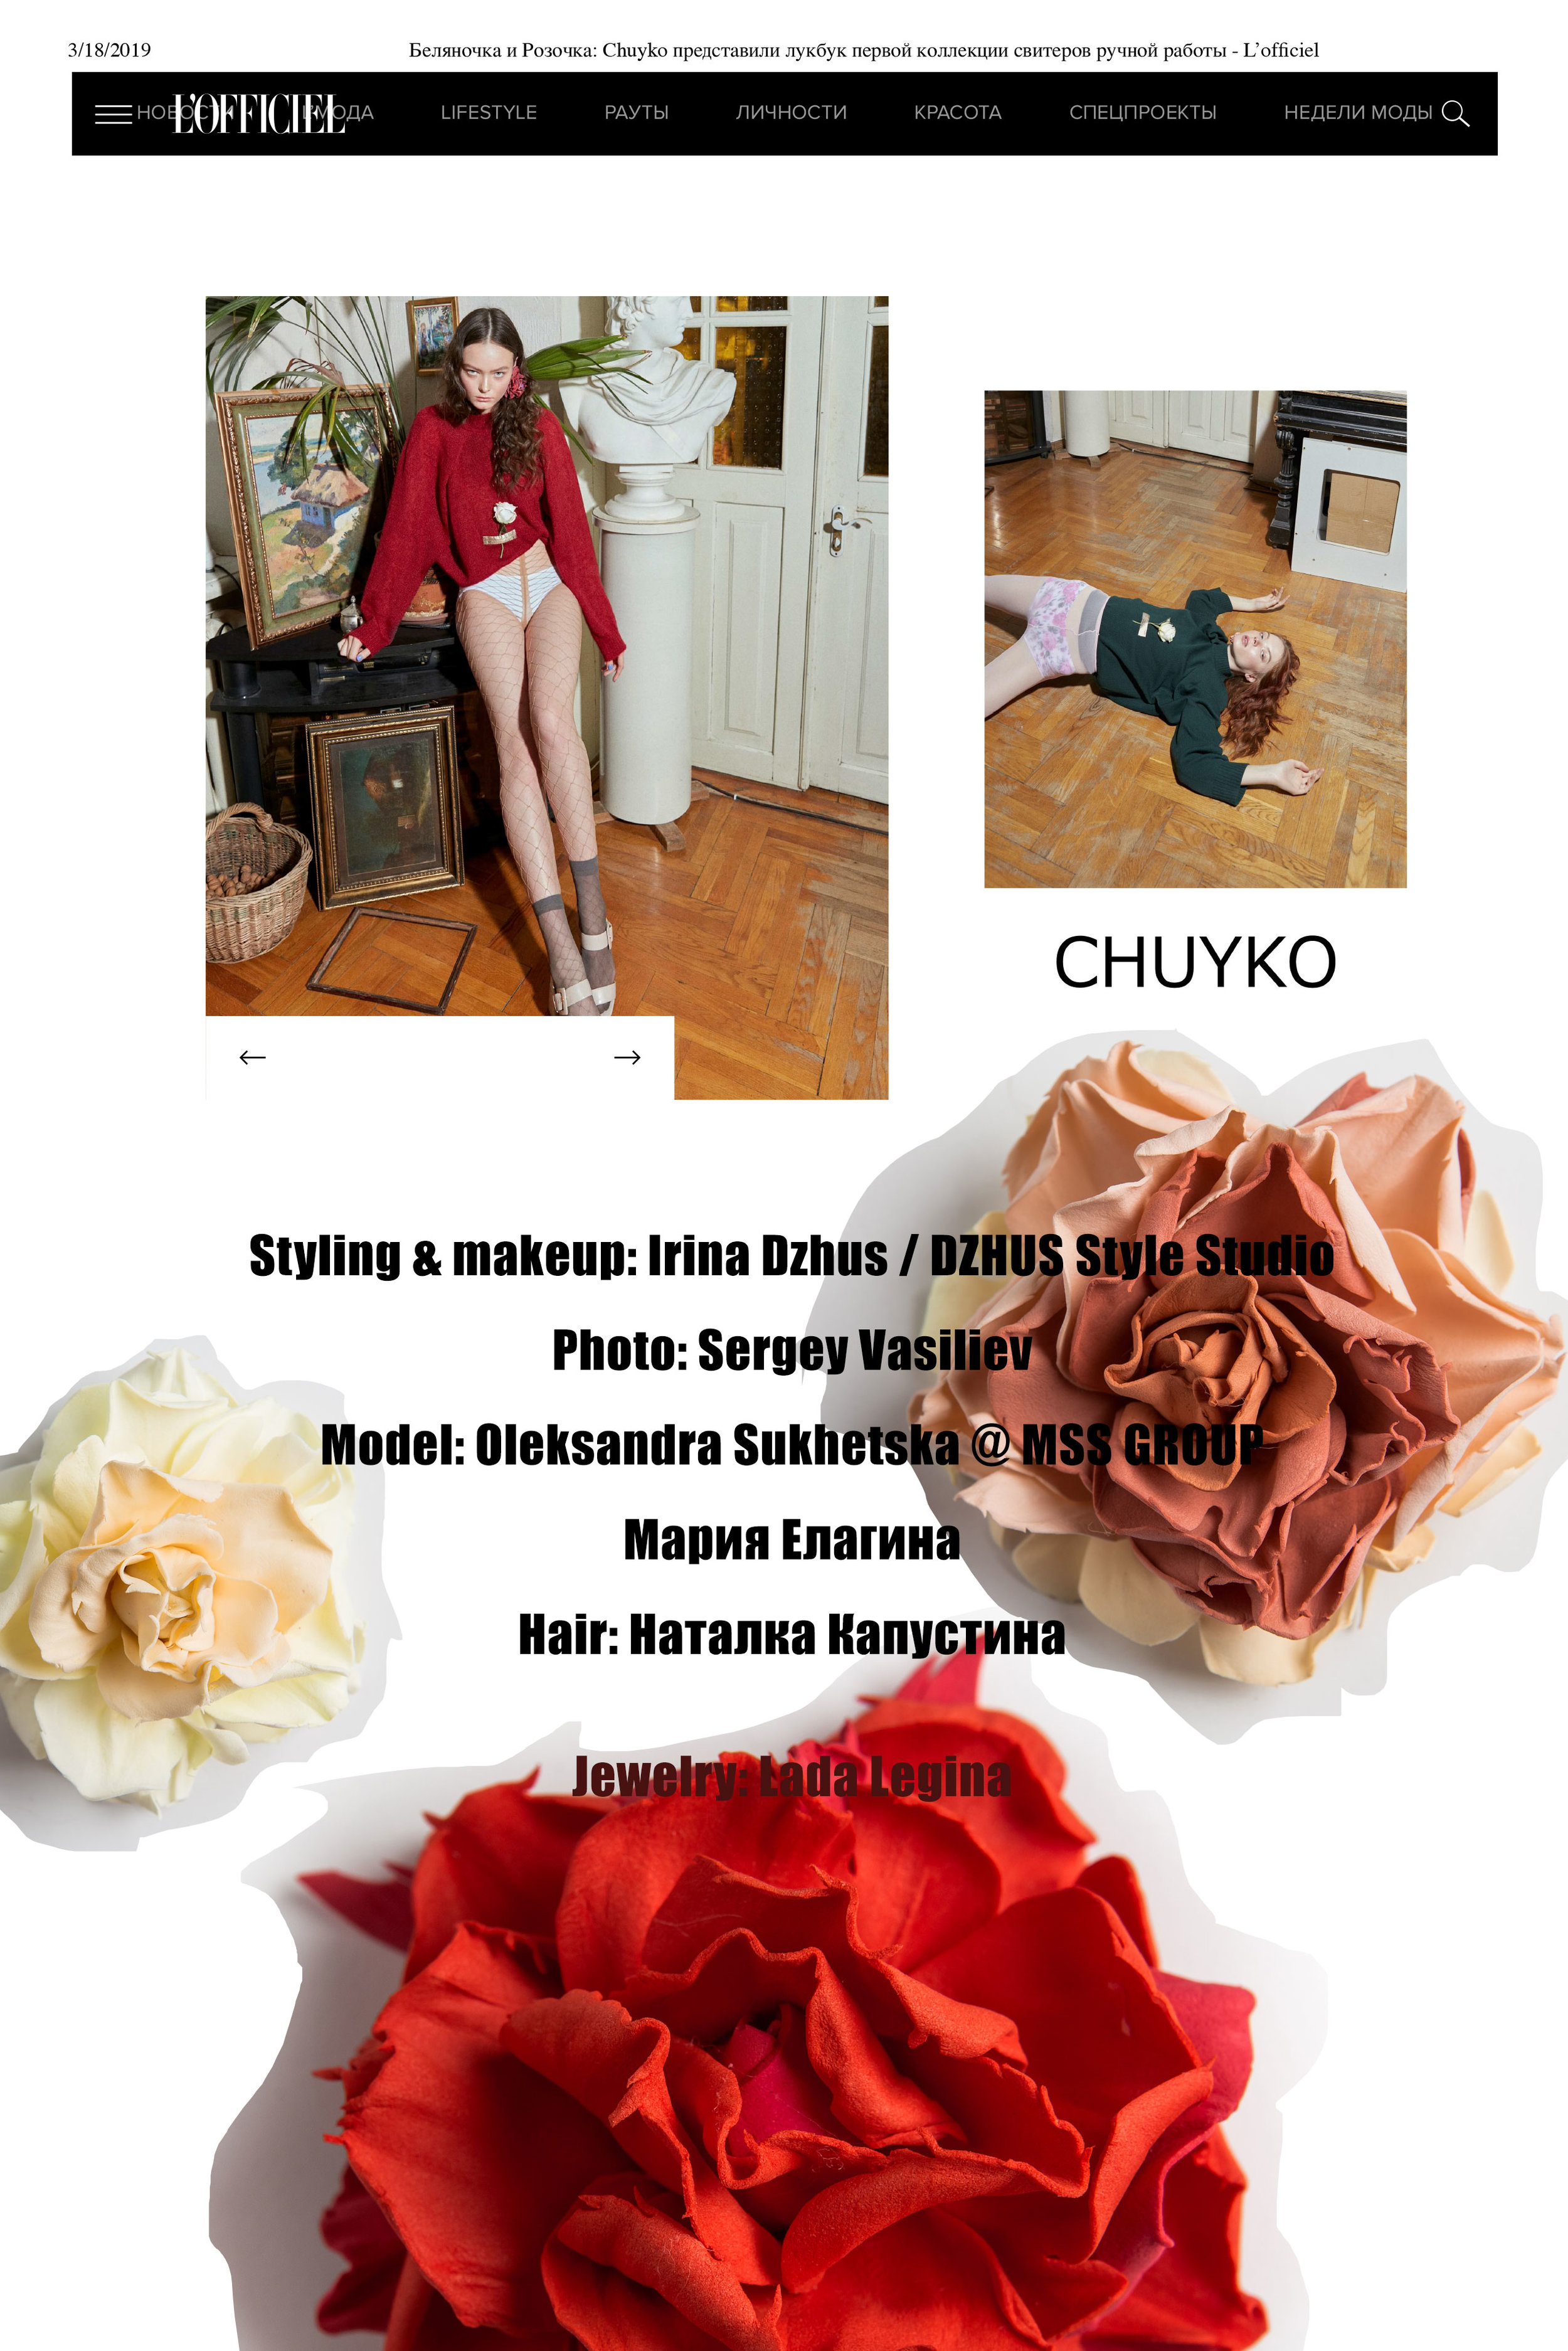 Lada-Legina-flowers-&-Chuyko-L'officiel.jpg